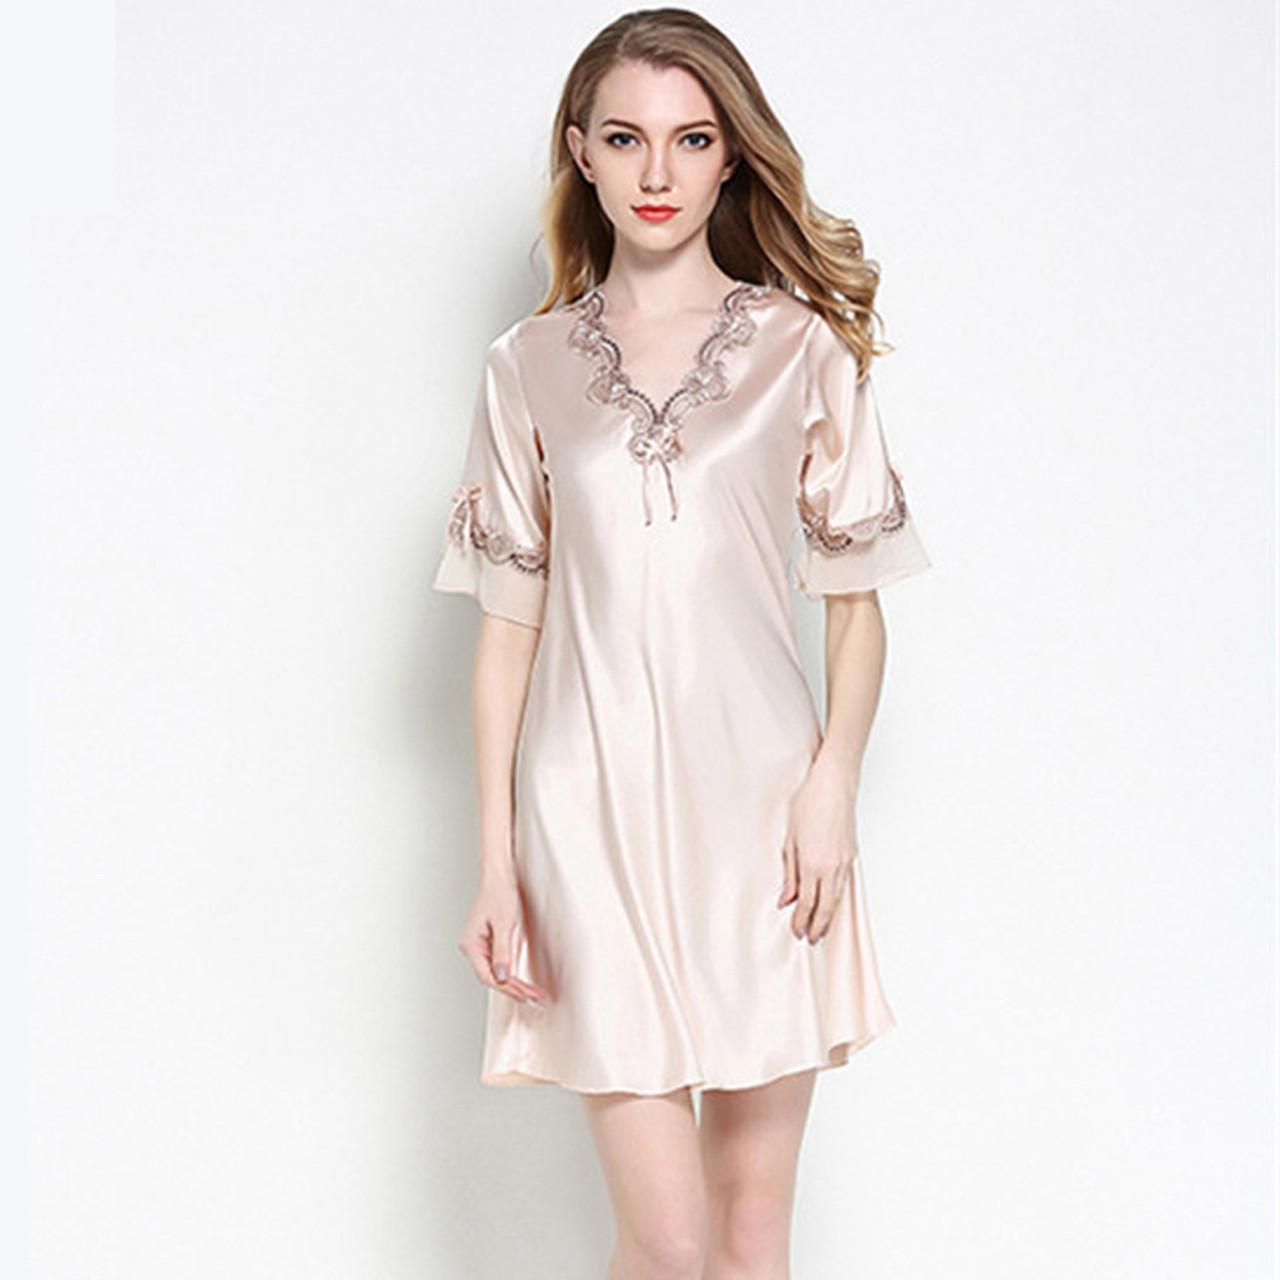 6309d226141 Women Silk Satin Nightgown Short Sleeve Sleepshirt V-neck Night Shirt  Elegant Night Dress Lace ...